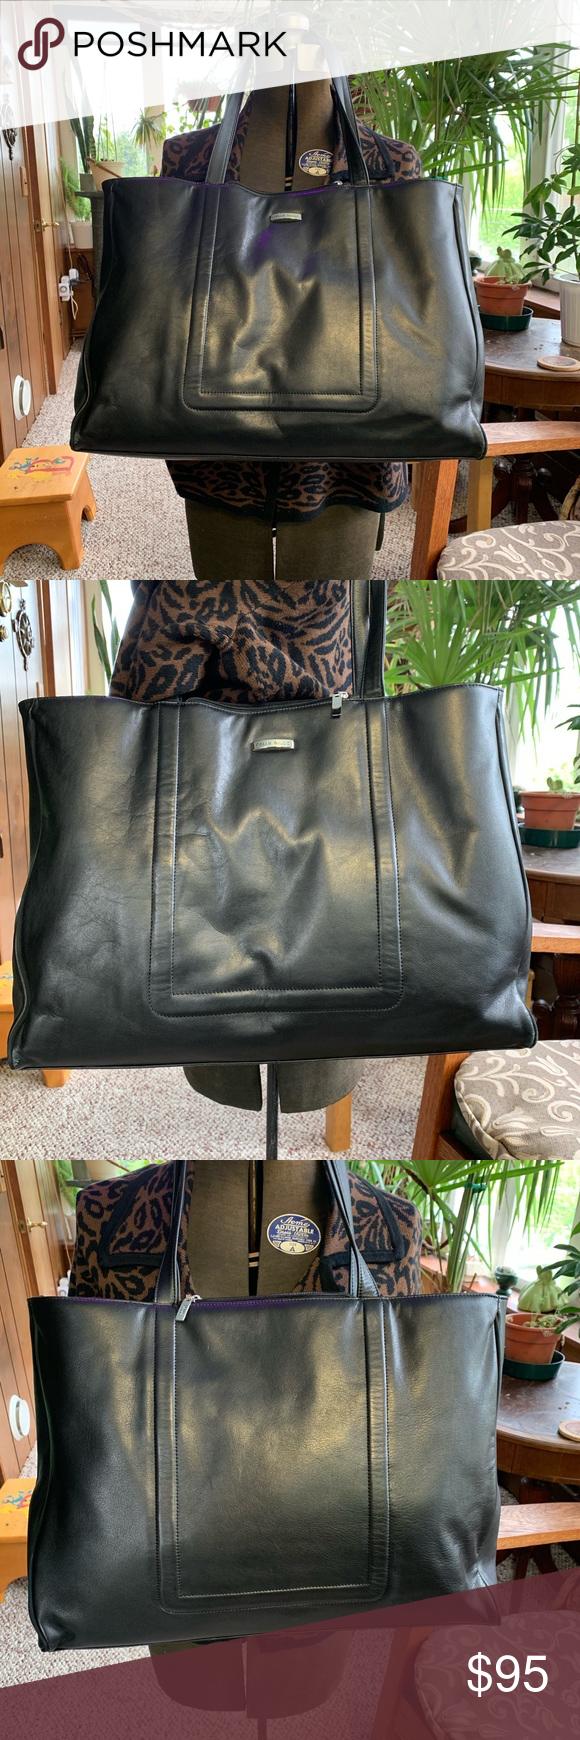 Pelle Studio Leather Bag Briefcase Black EUC Leather bag